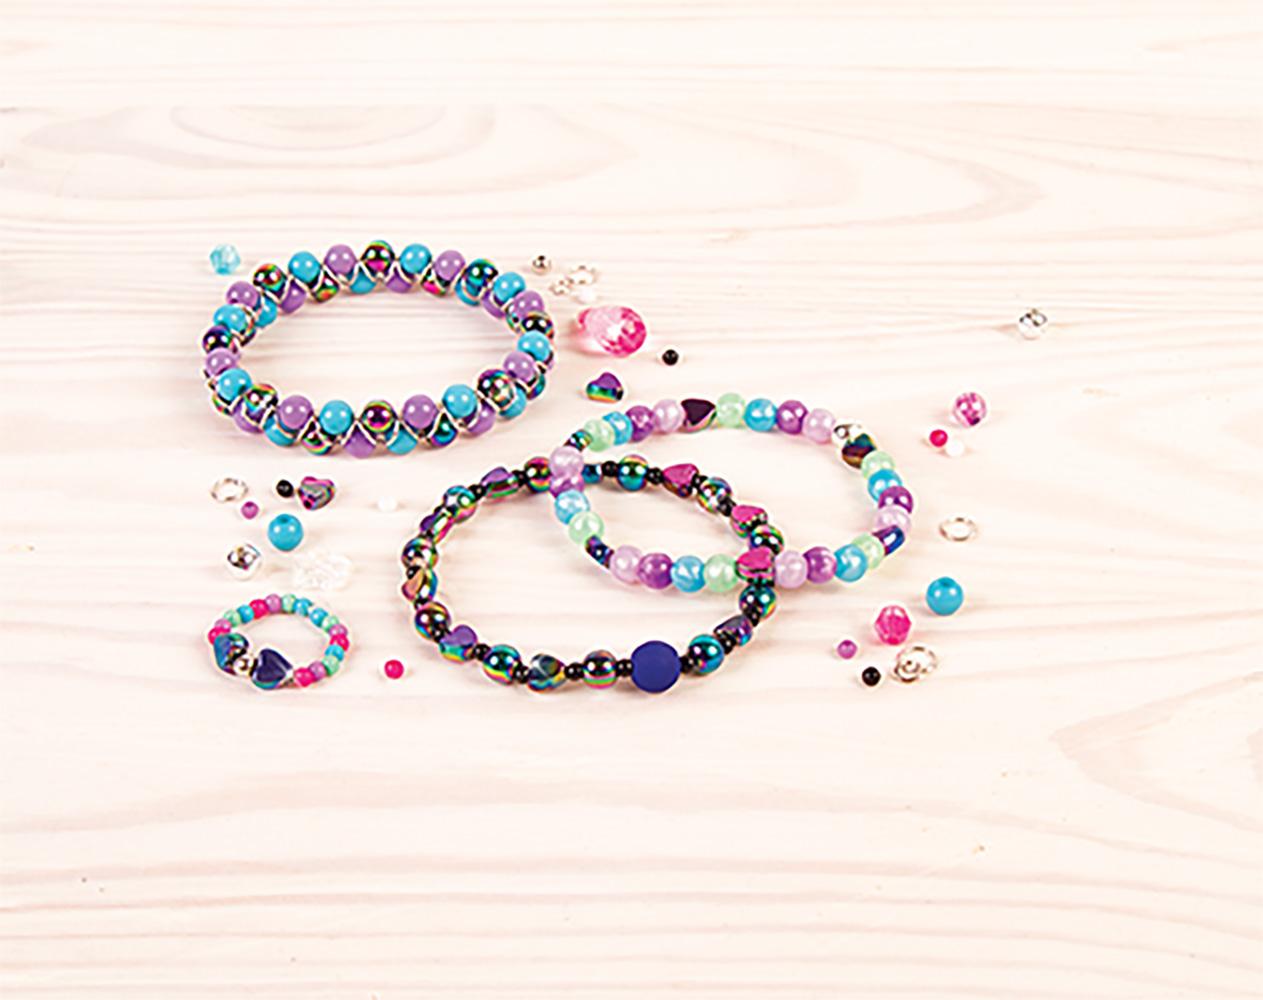 Make it real - Studio de perles ultime (Disponibilité fin novembre)